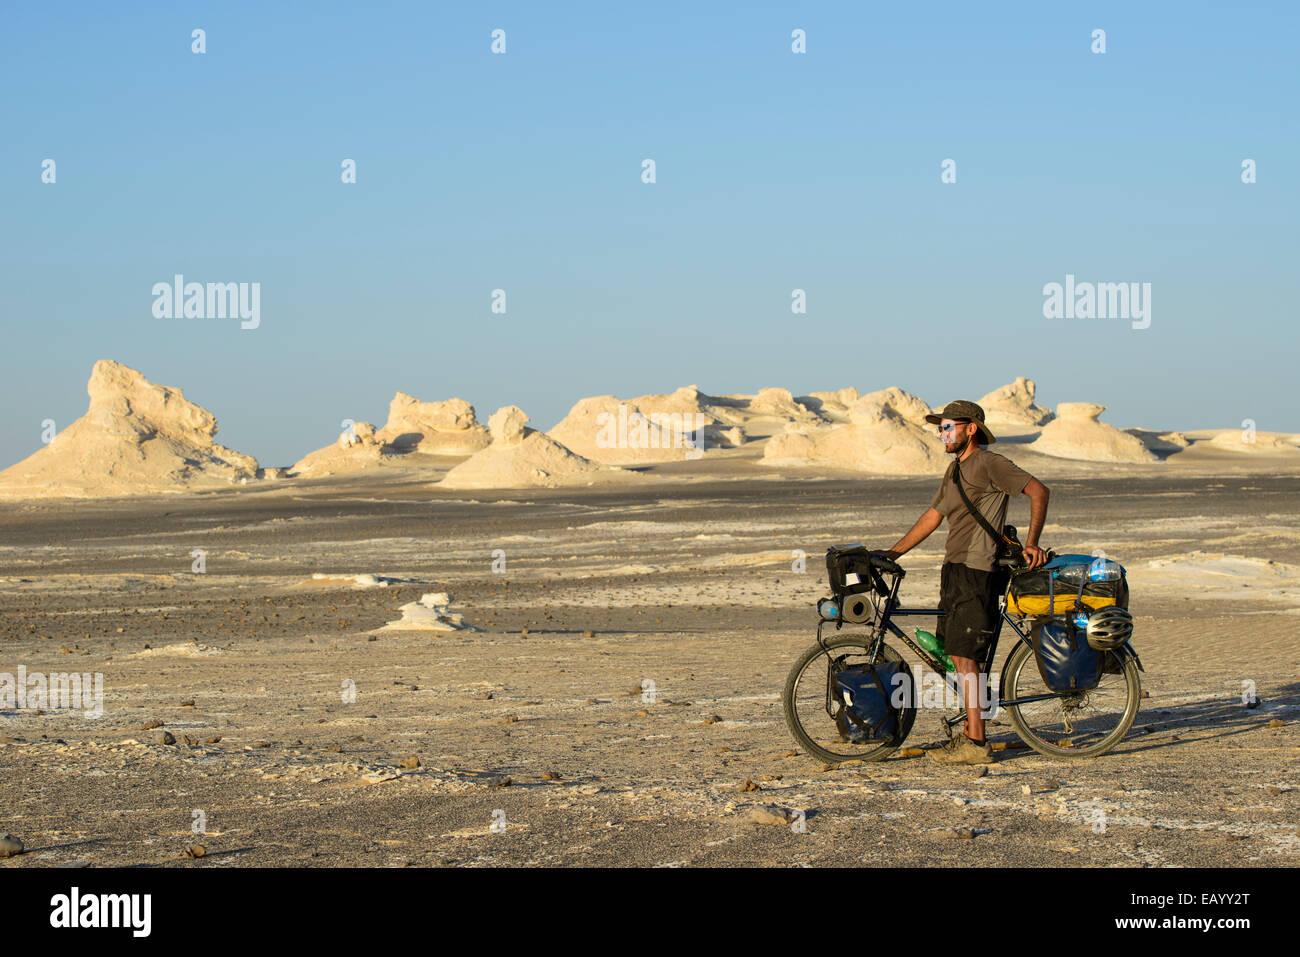 Cycling in the Sahara White desert, Egypt Stock Photo